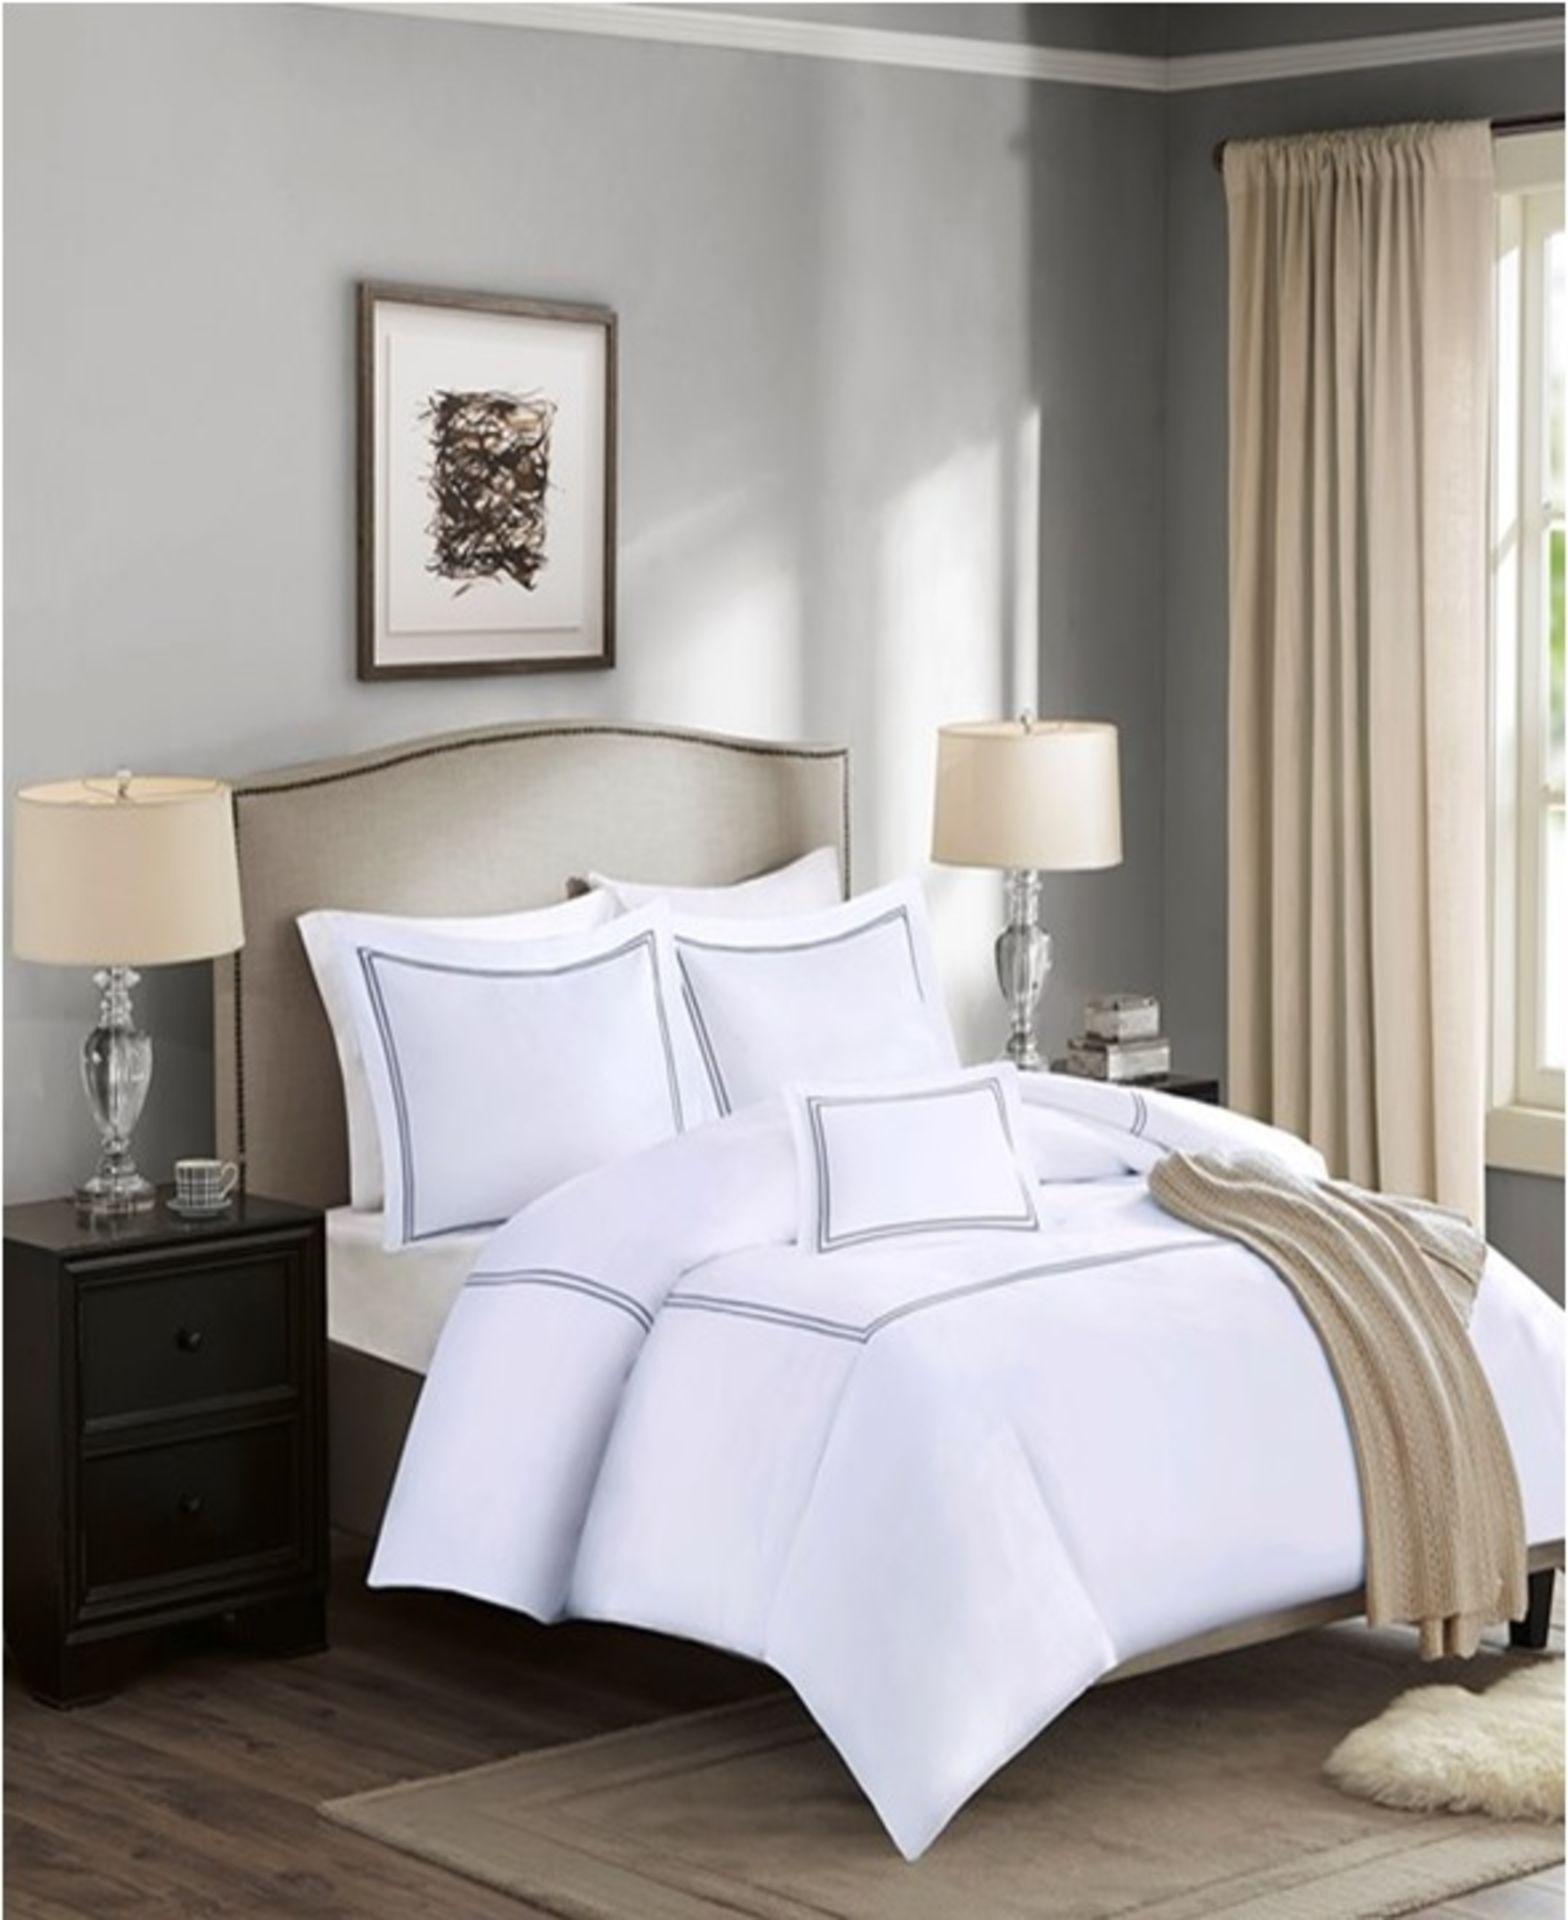 Lot 146 - 1 x Madison Park Luxury Collection Double Duvet Set White - Product Code MP12-0198UK (Brand New -